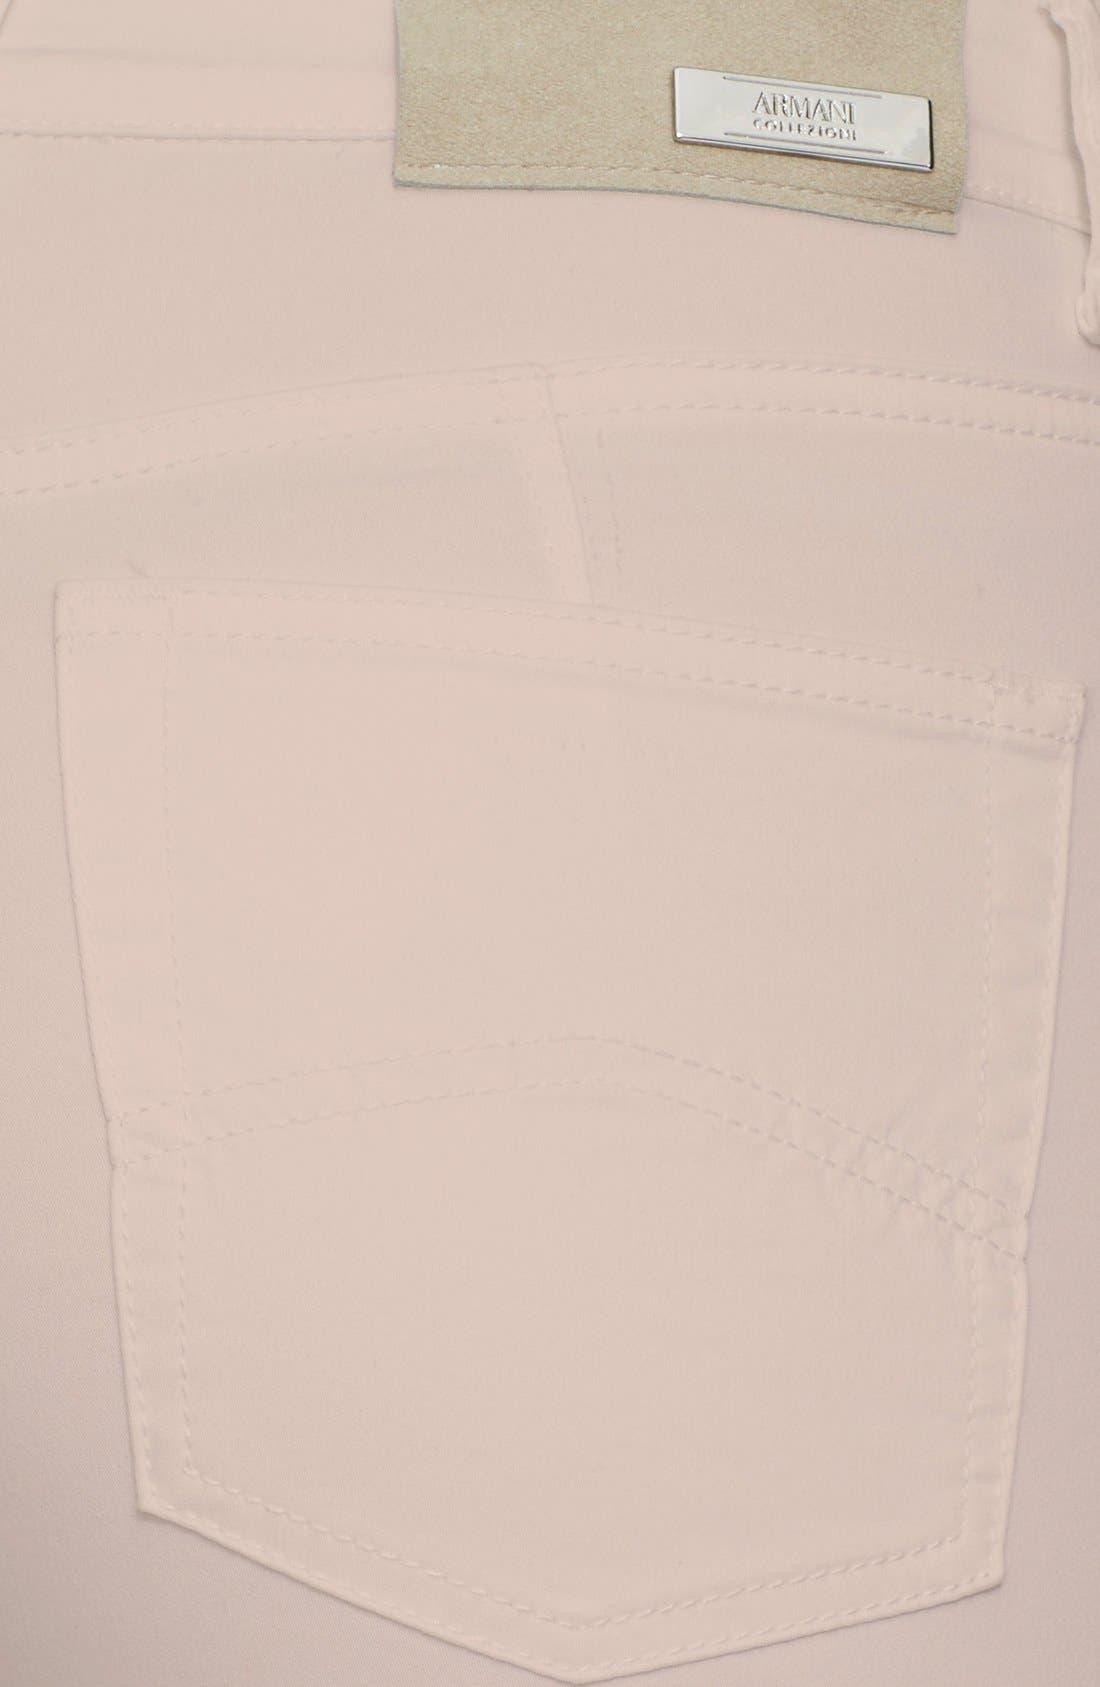 ARMANI COLLEZIONI, Slim Brushed Cotton Jeans, Alternate thumbnail 2, color, 272